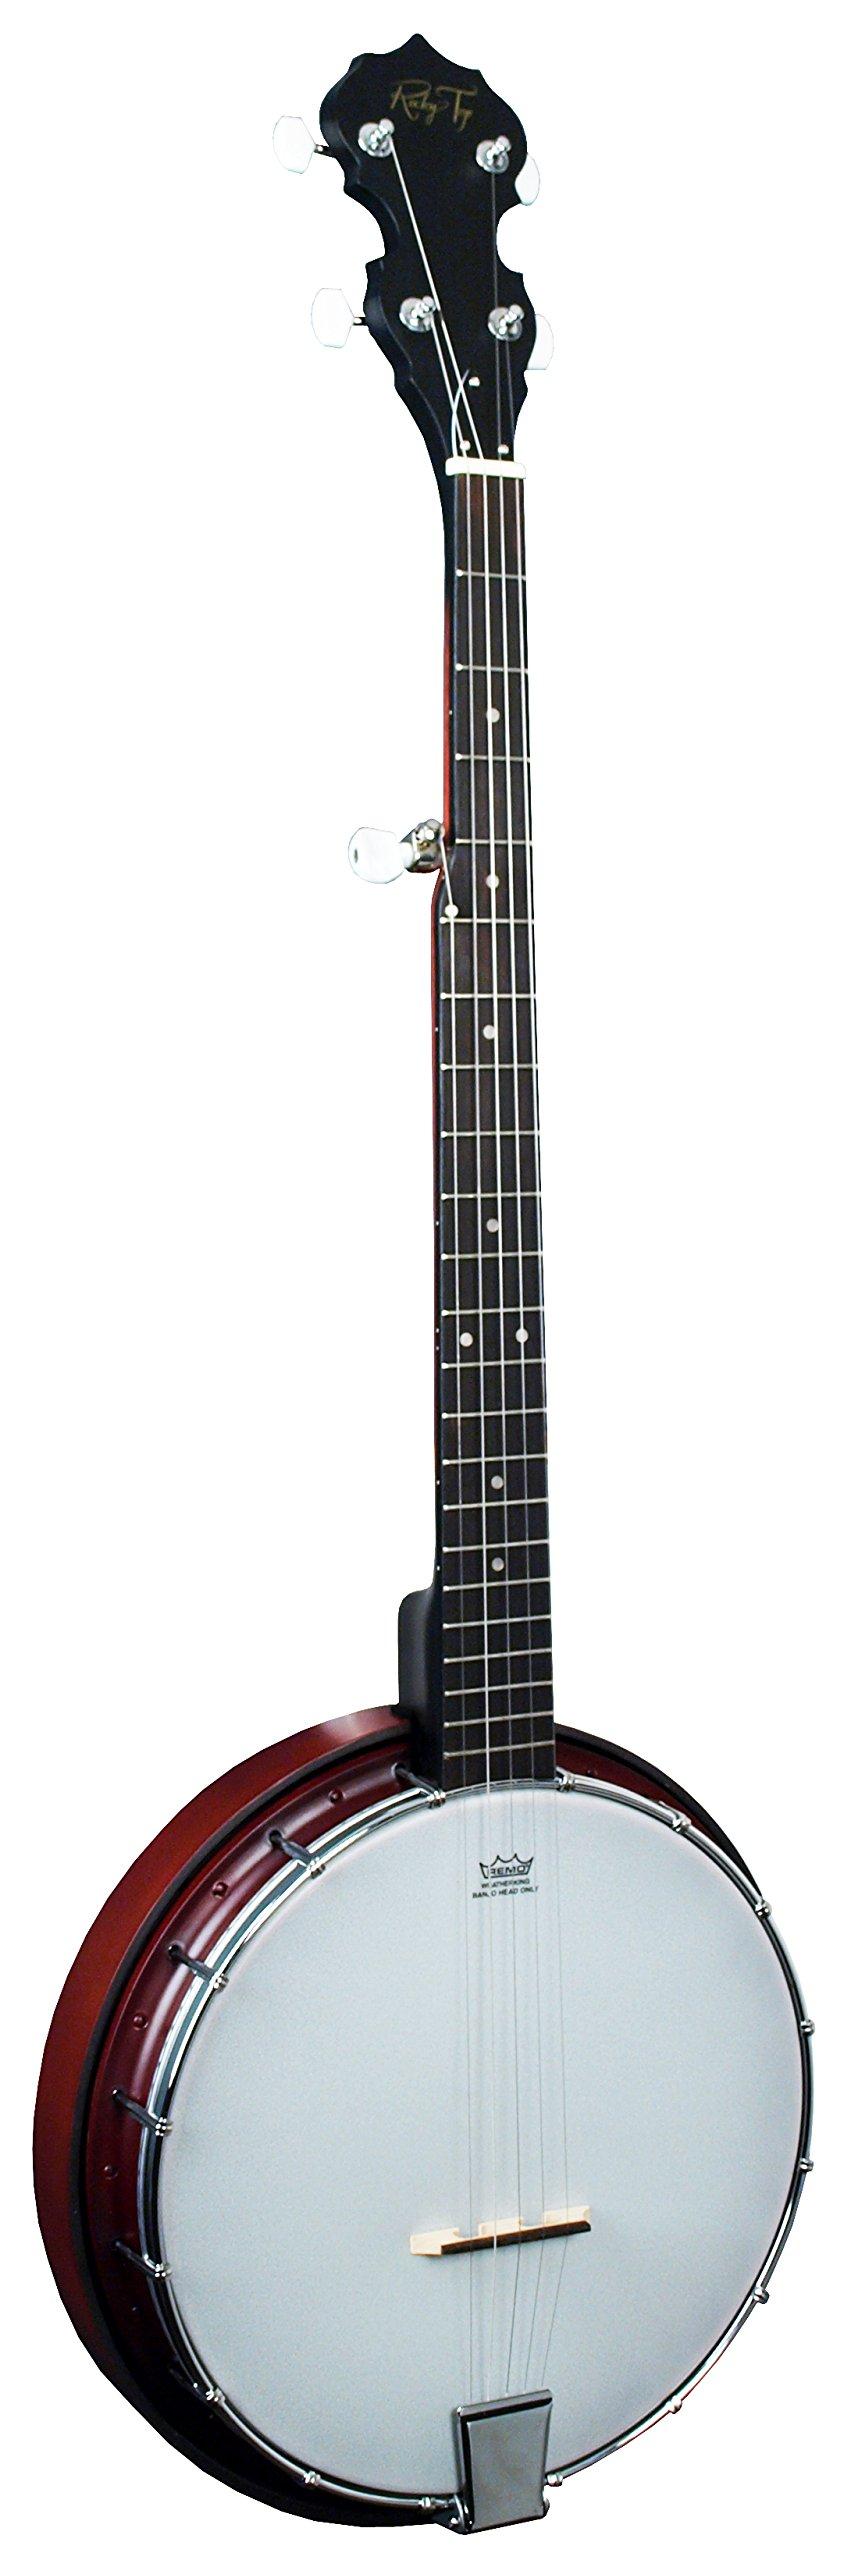 Morgan Monroe RT-B01 Rocky Top Hoedown 5 String Resonator Banjo